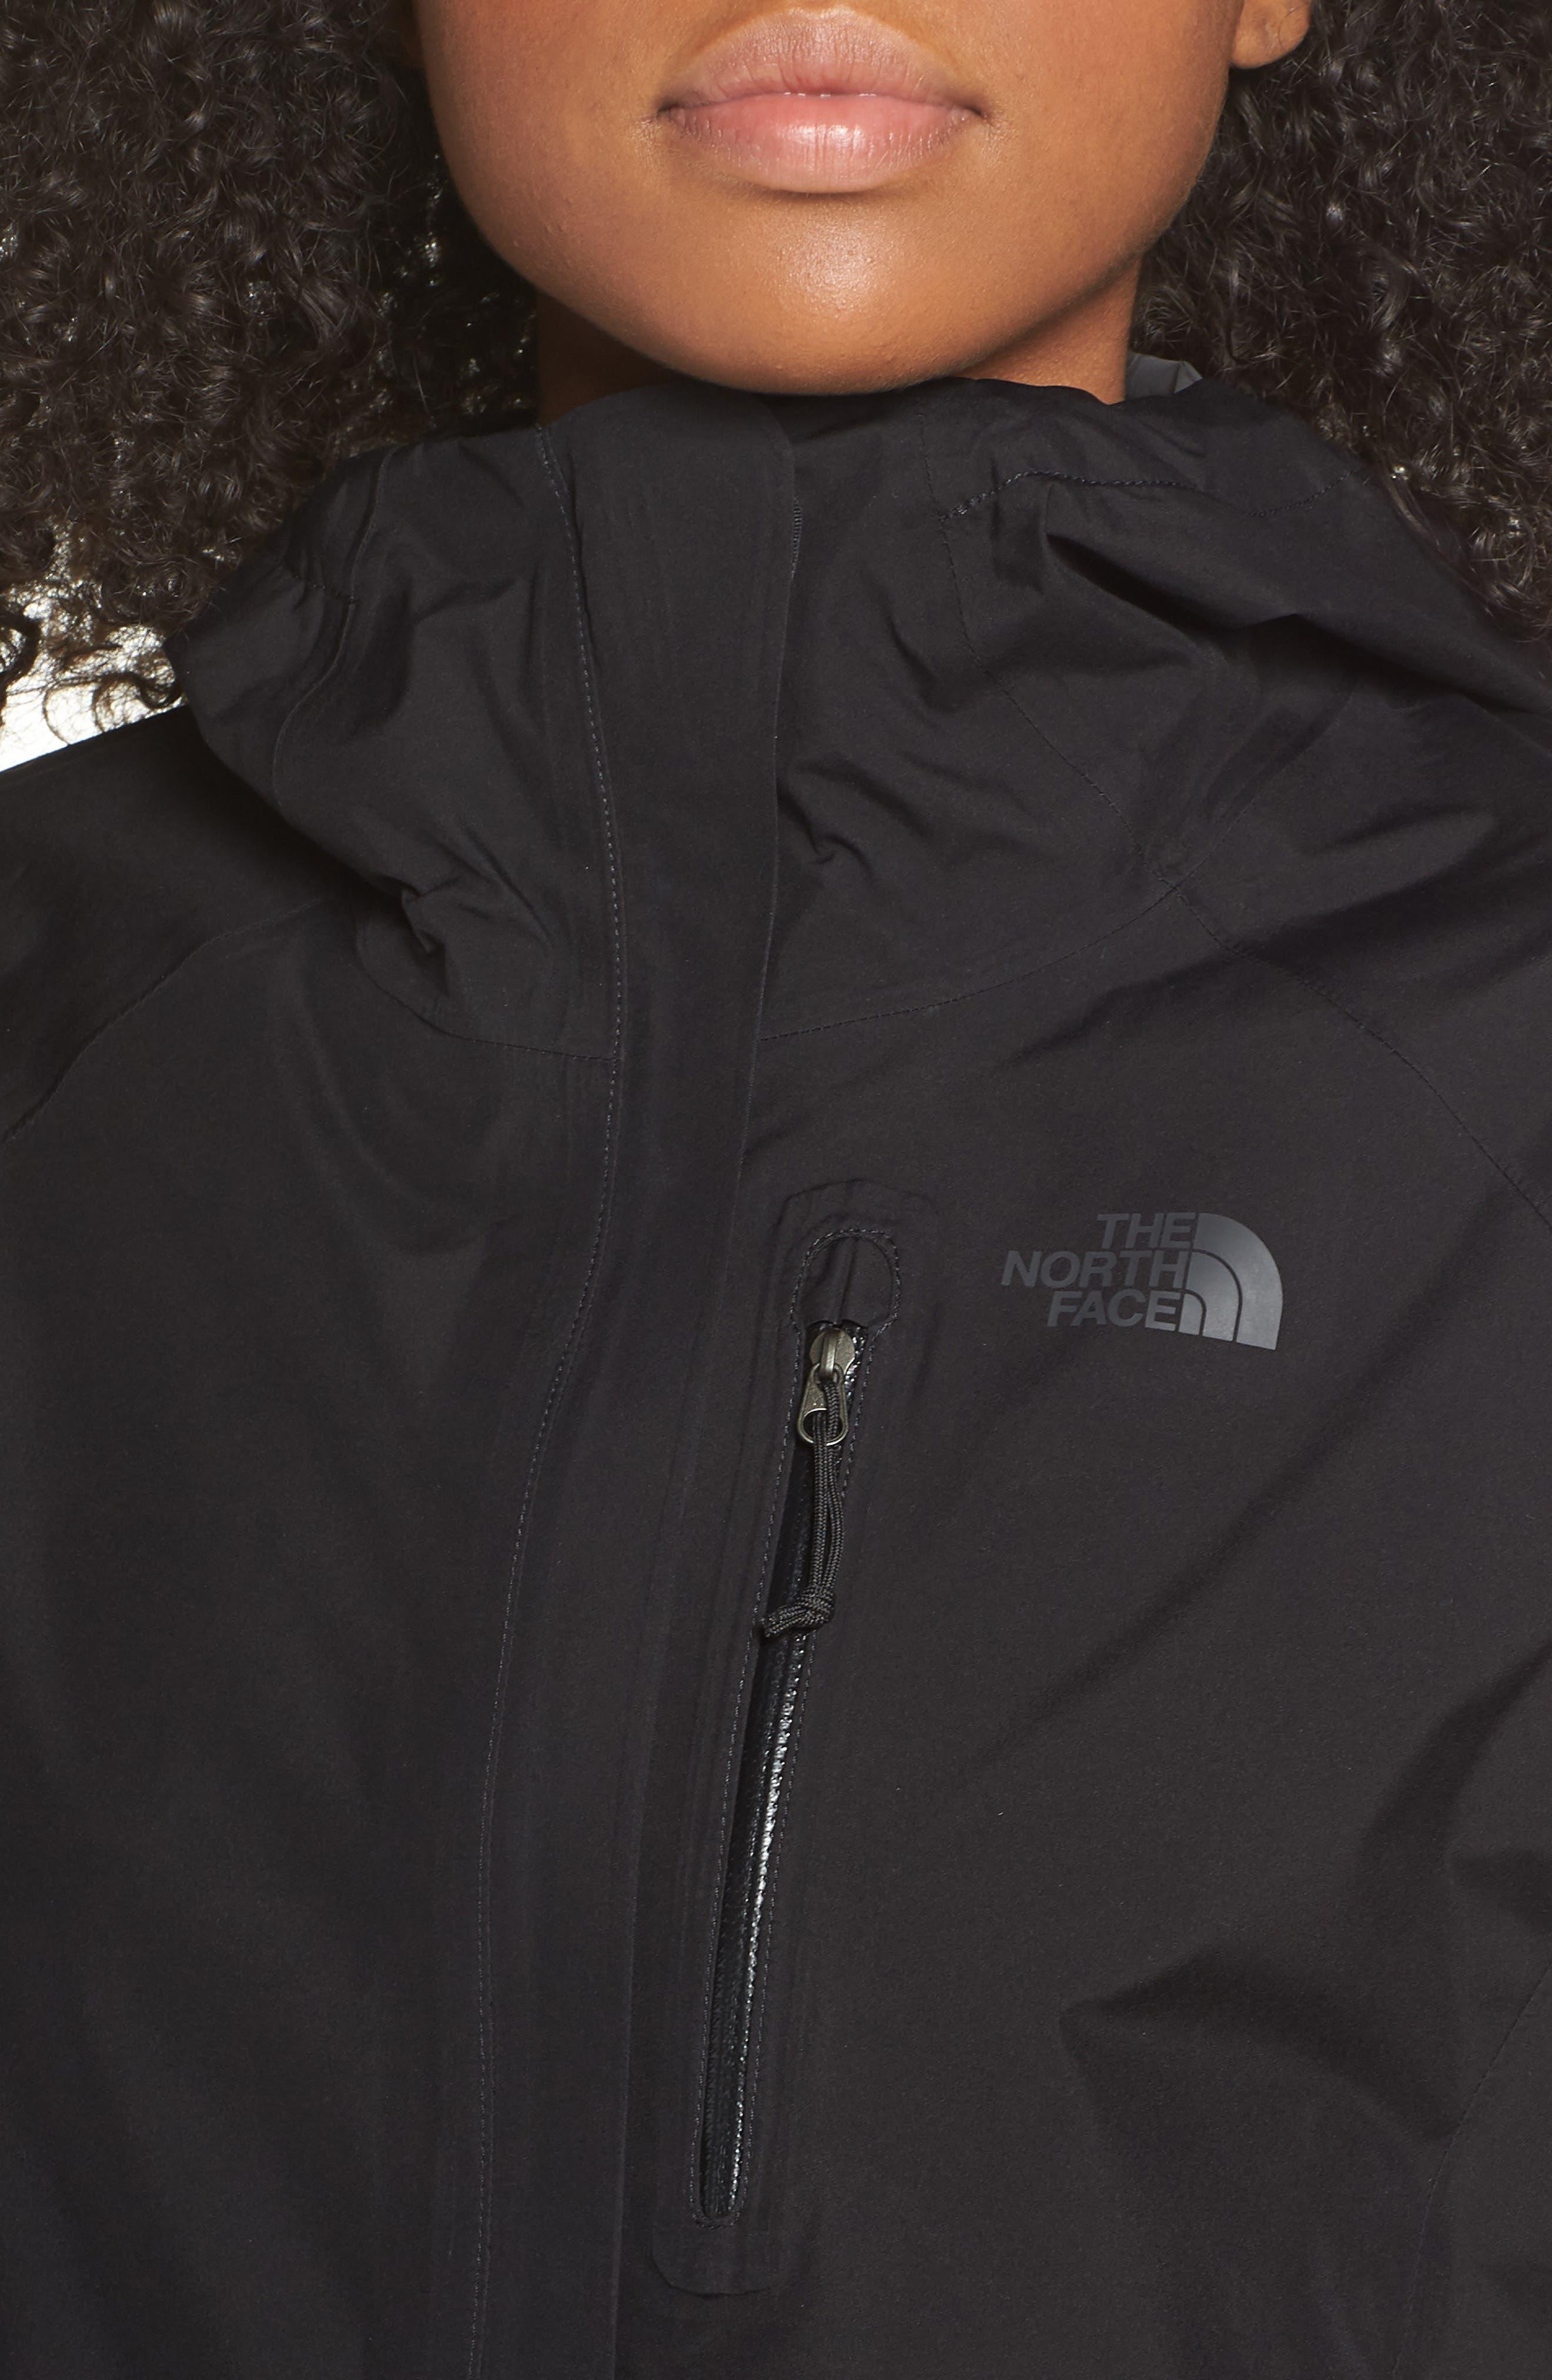 THE NORTH FACE, Dryzzle Hooded Rain Jacket, Alternate thumbnail 5, color, TNF BLACK